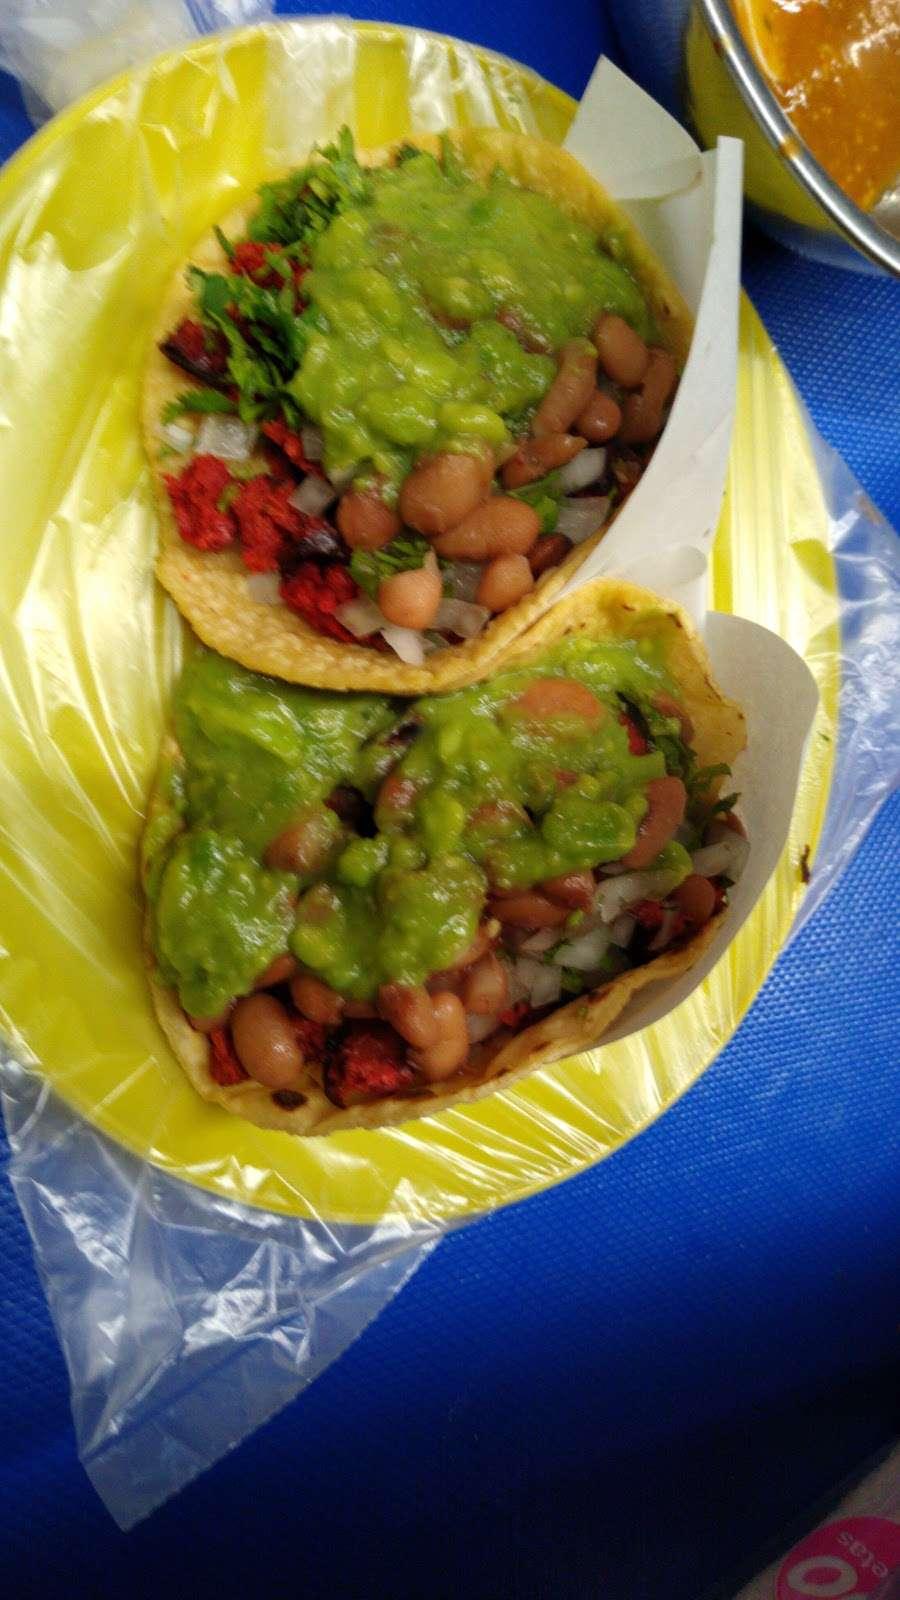 tacos noemi - restaurant    Photo 1 of 8   Address: Av. Ignacio Allende 7096, Azcona, 22100 Tijuana, B.C., Mexico